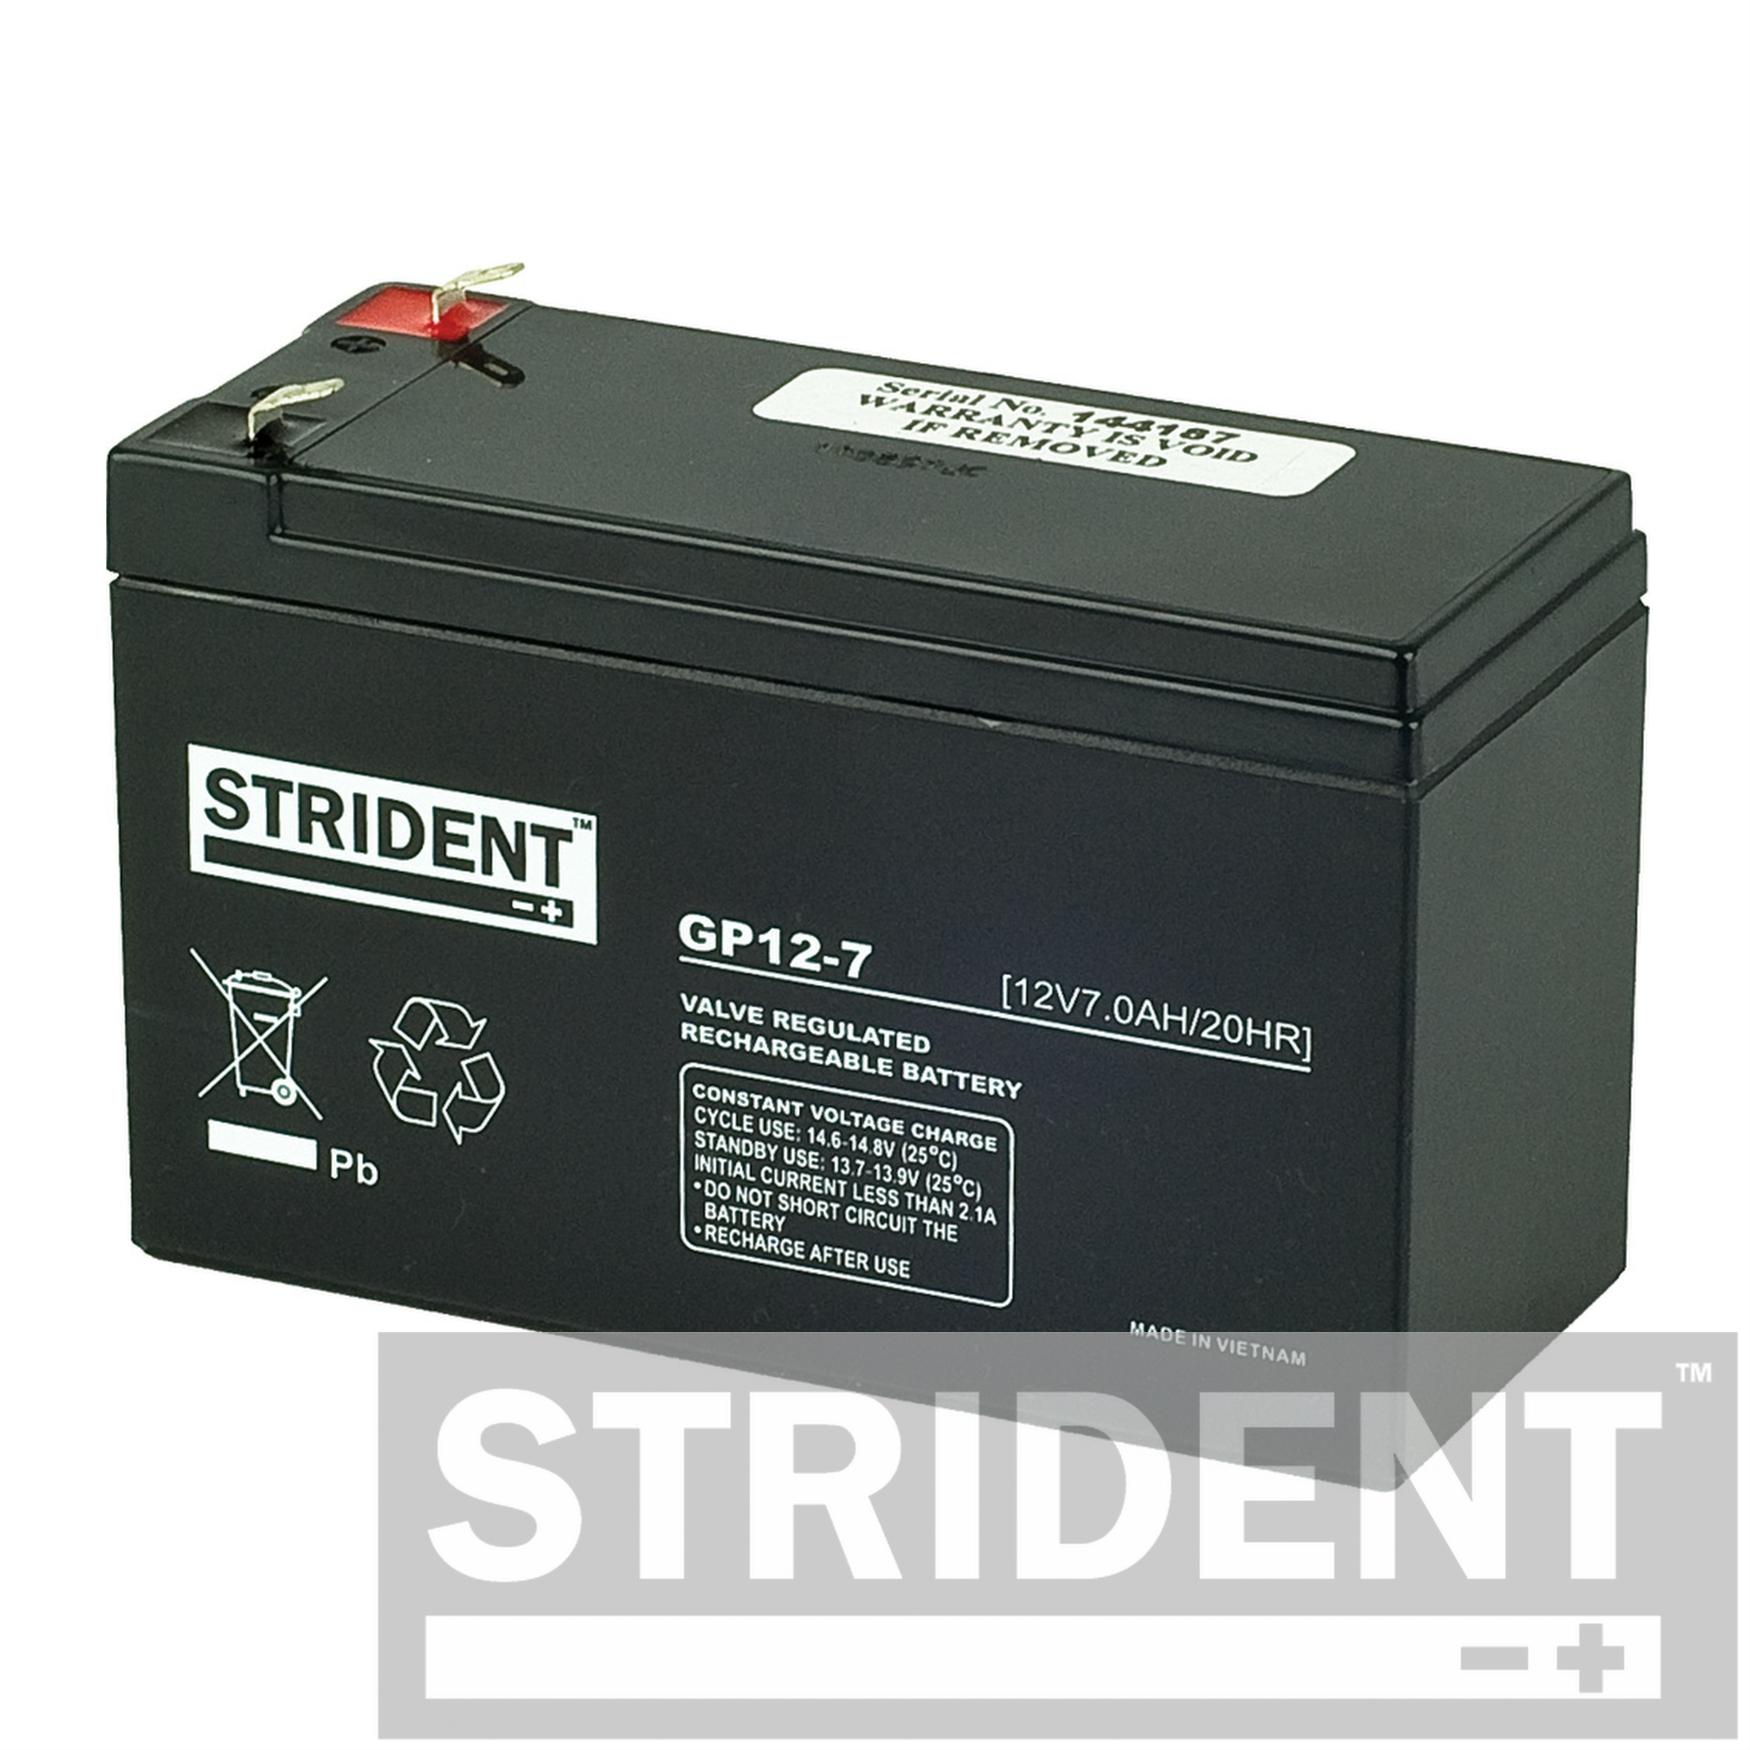 strident-agm-battery-gp12-7.jpg